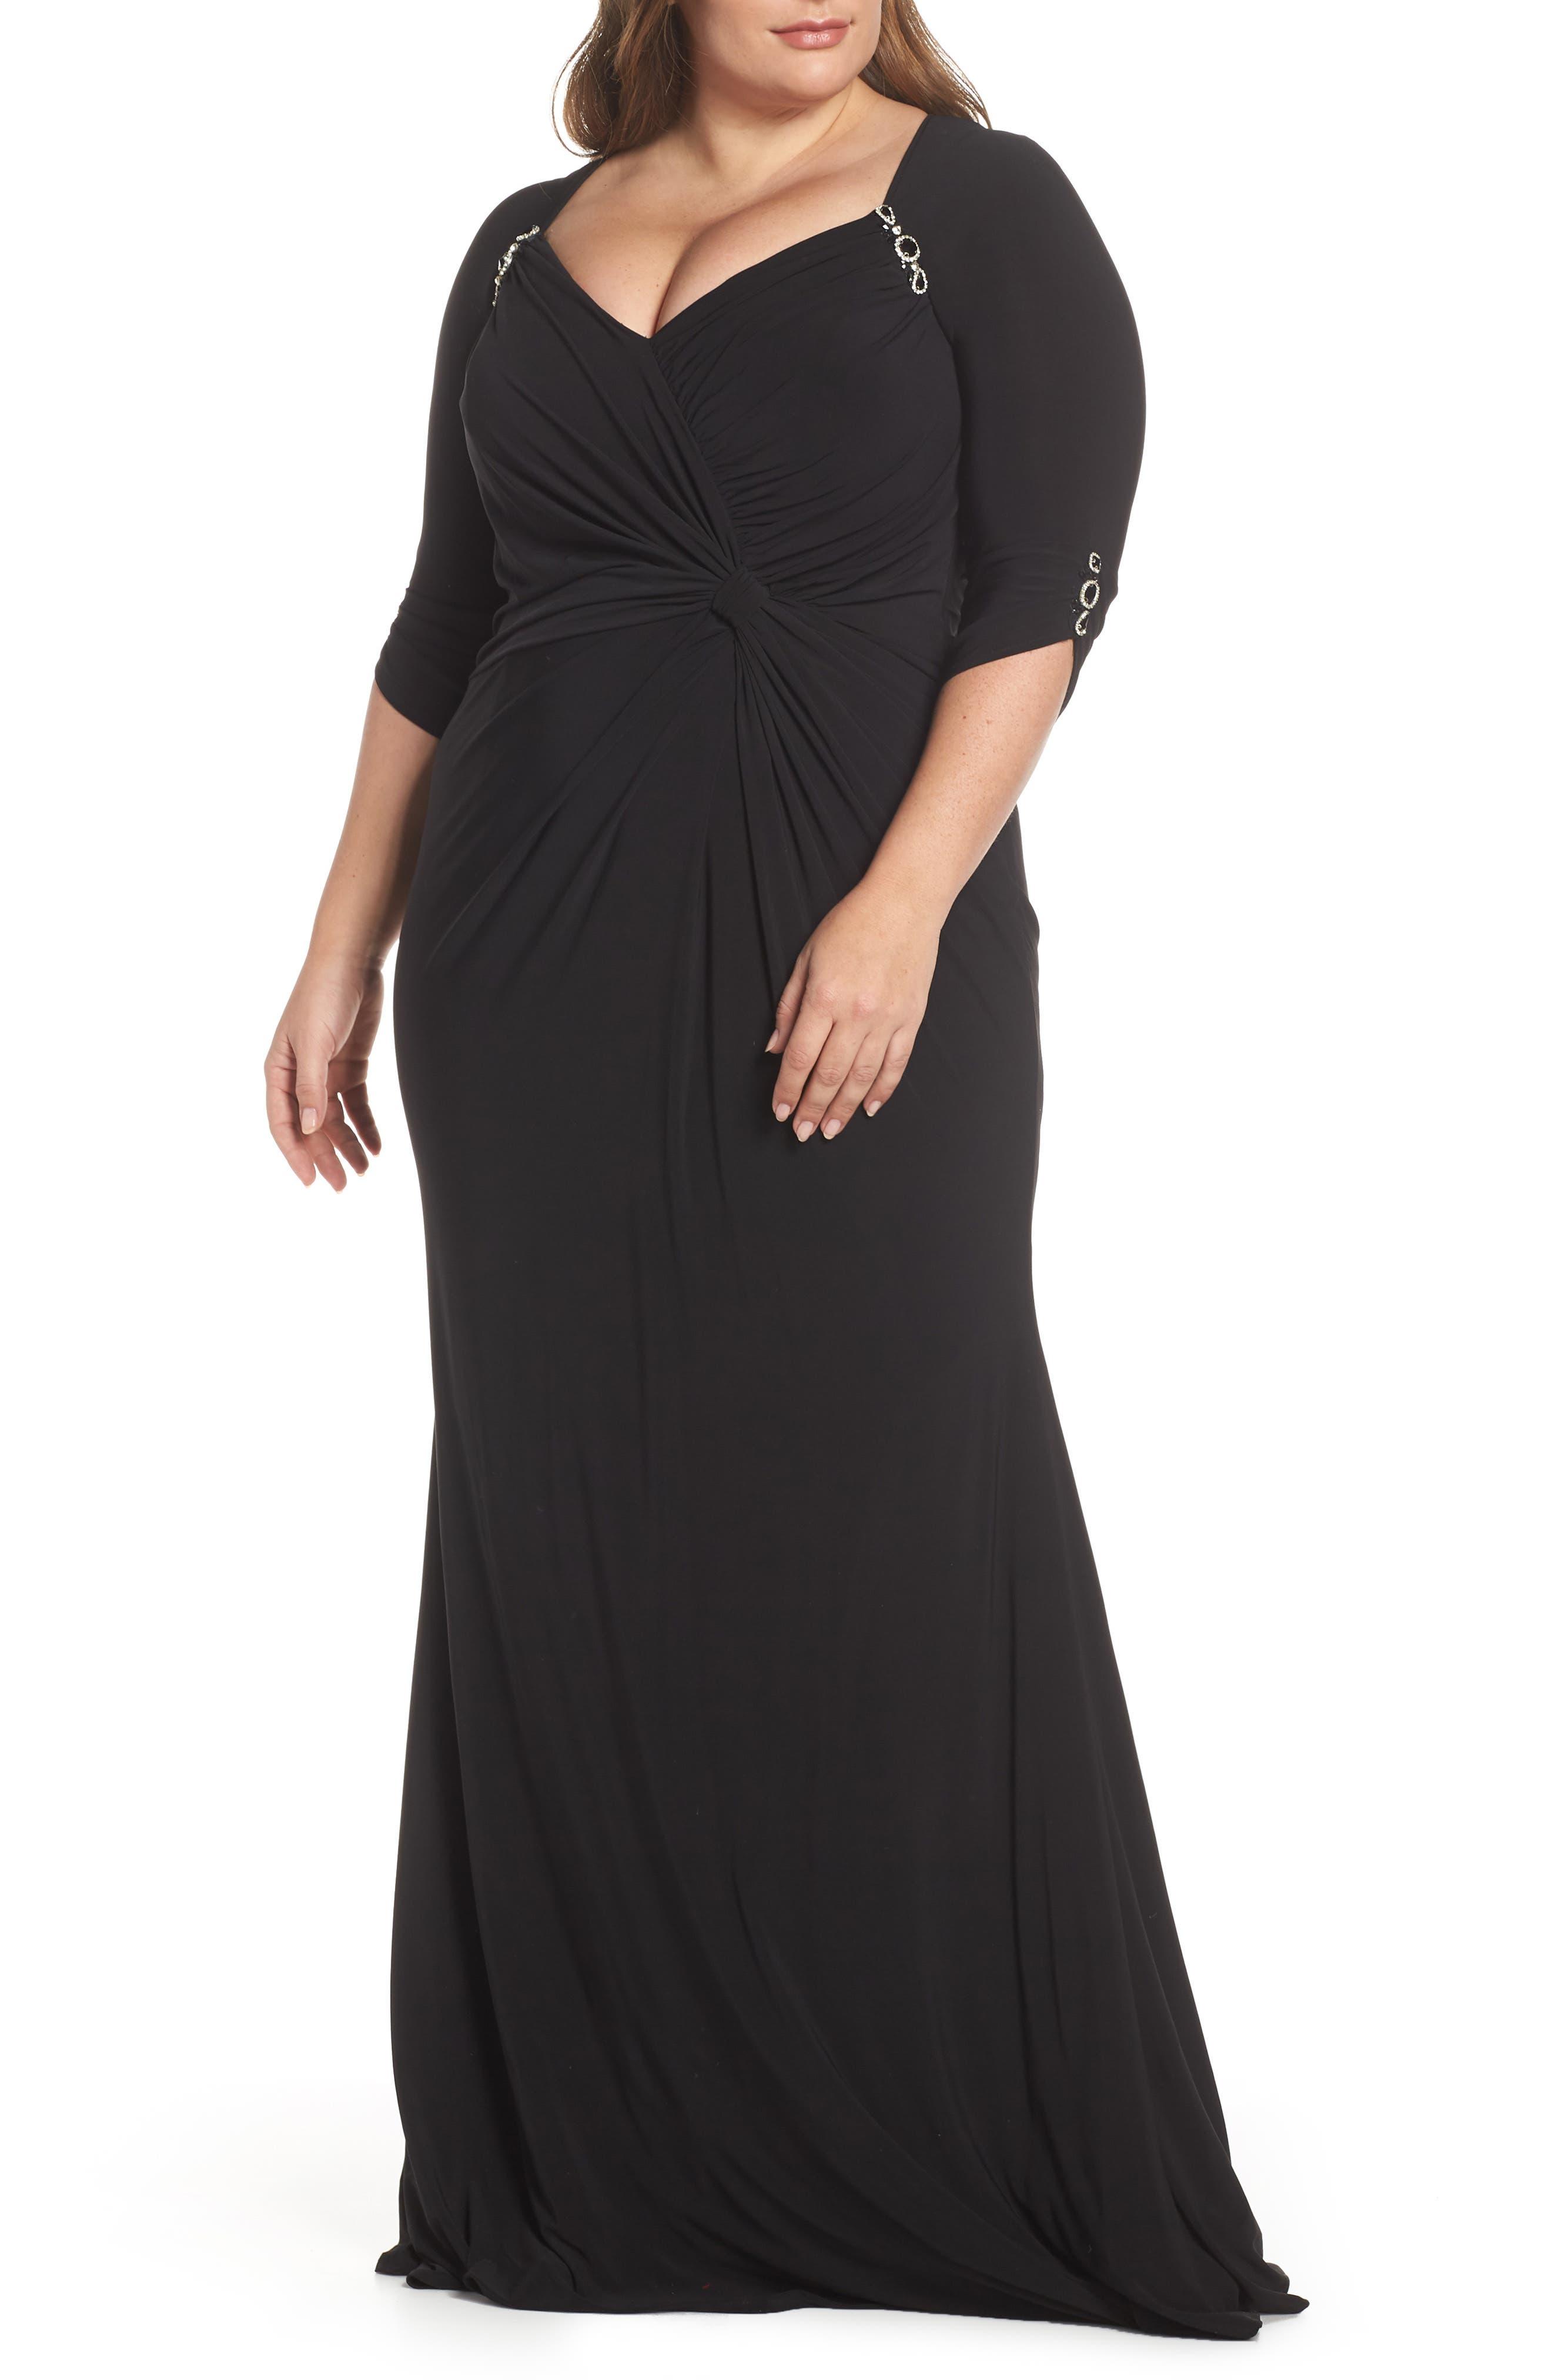 MAC DUGGAL, Crystal Embellished Twist Front Evening Dress, Main thumbnail 1, color, BLACK